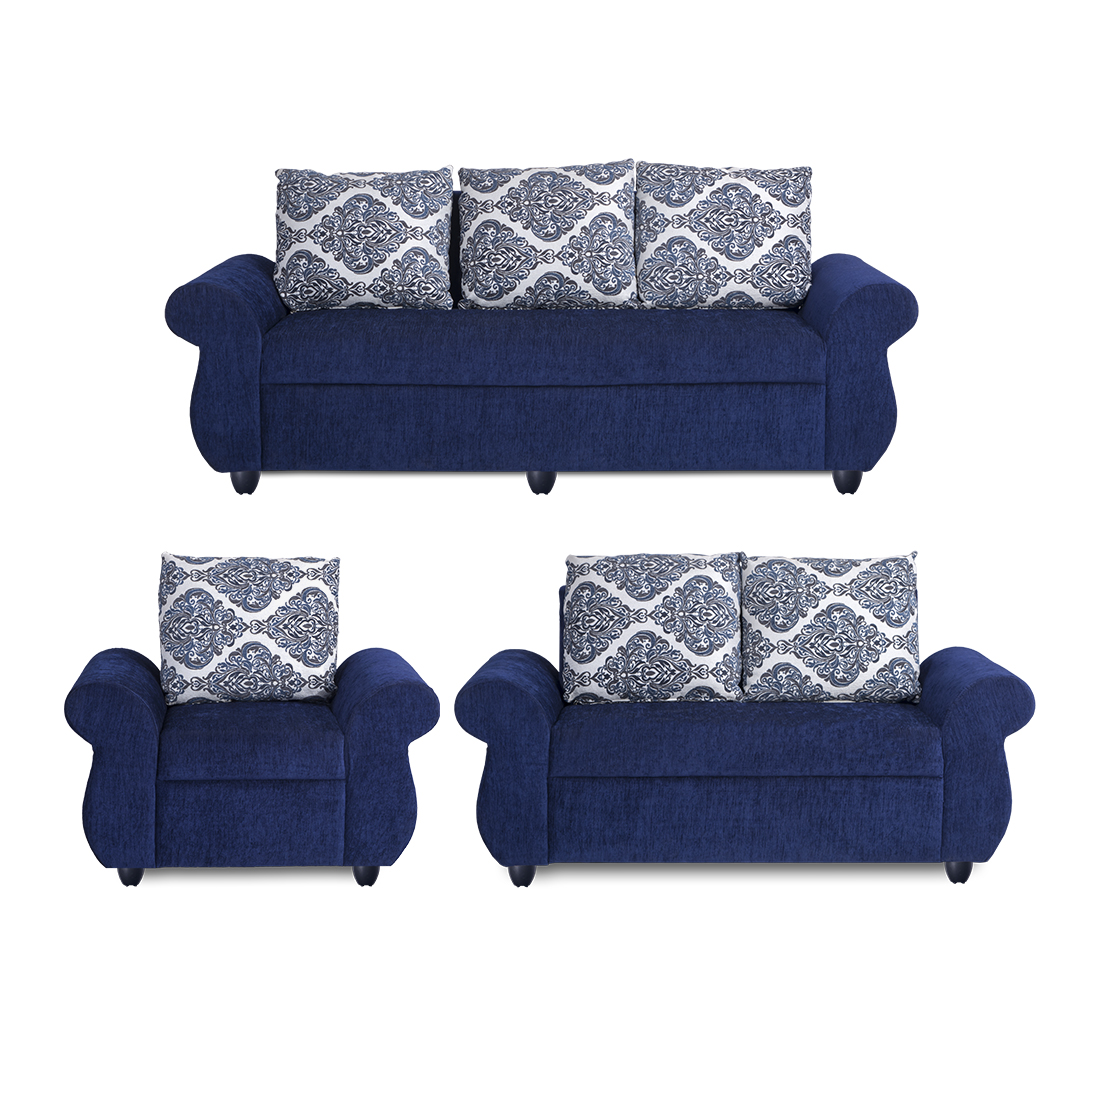 Bharat Lifestyle Alisa Fabric 3 + 2 + 1 Blue Sofa Set